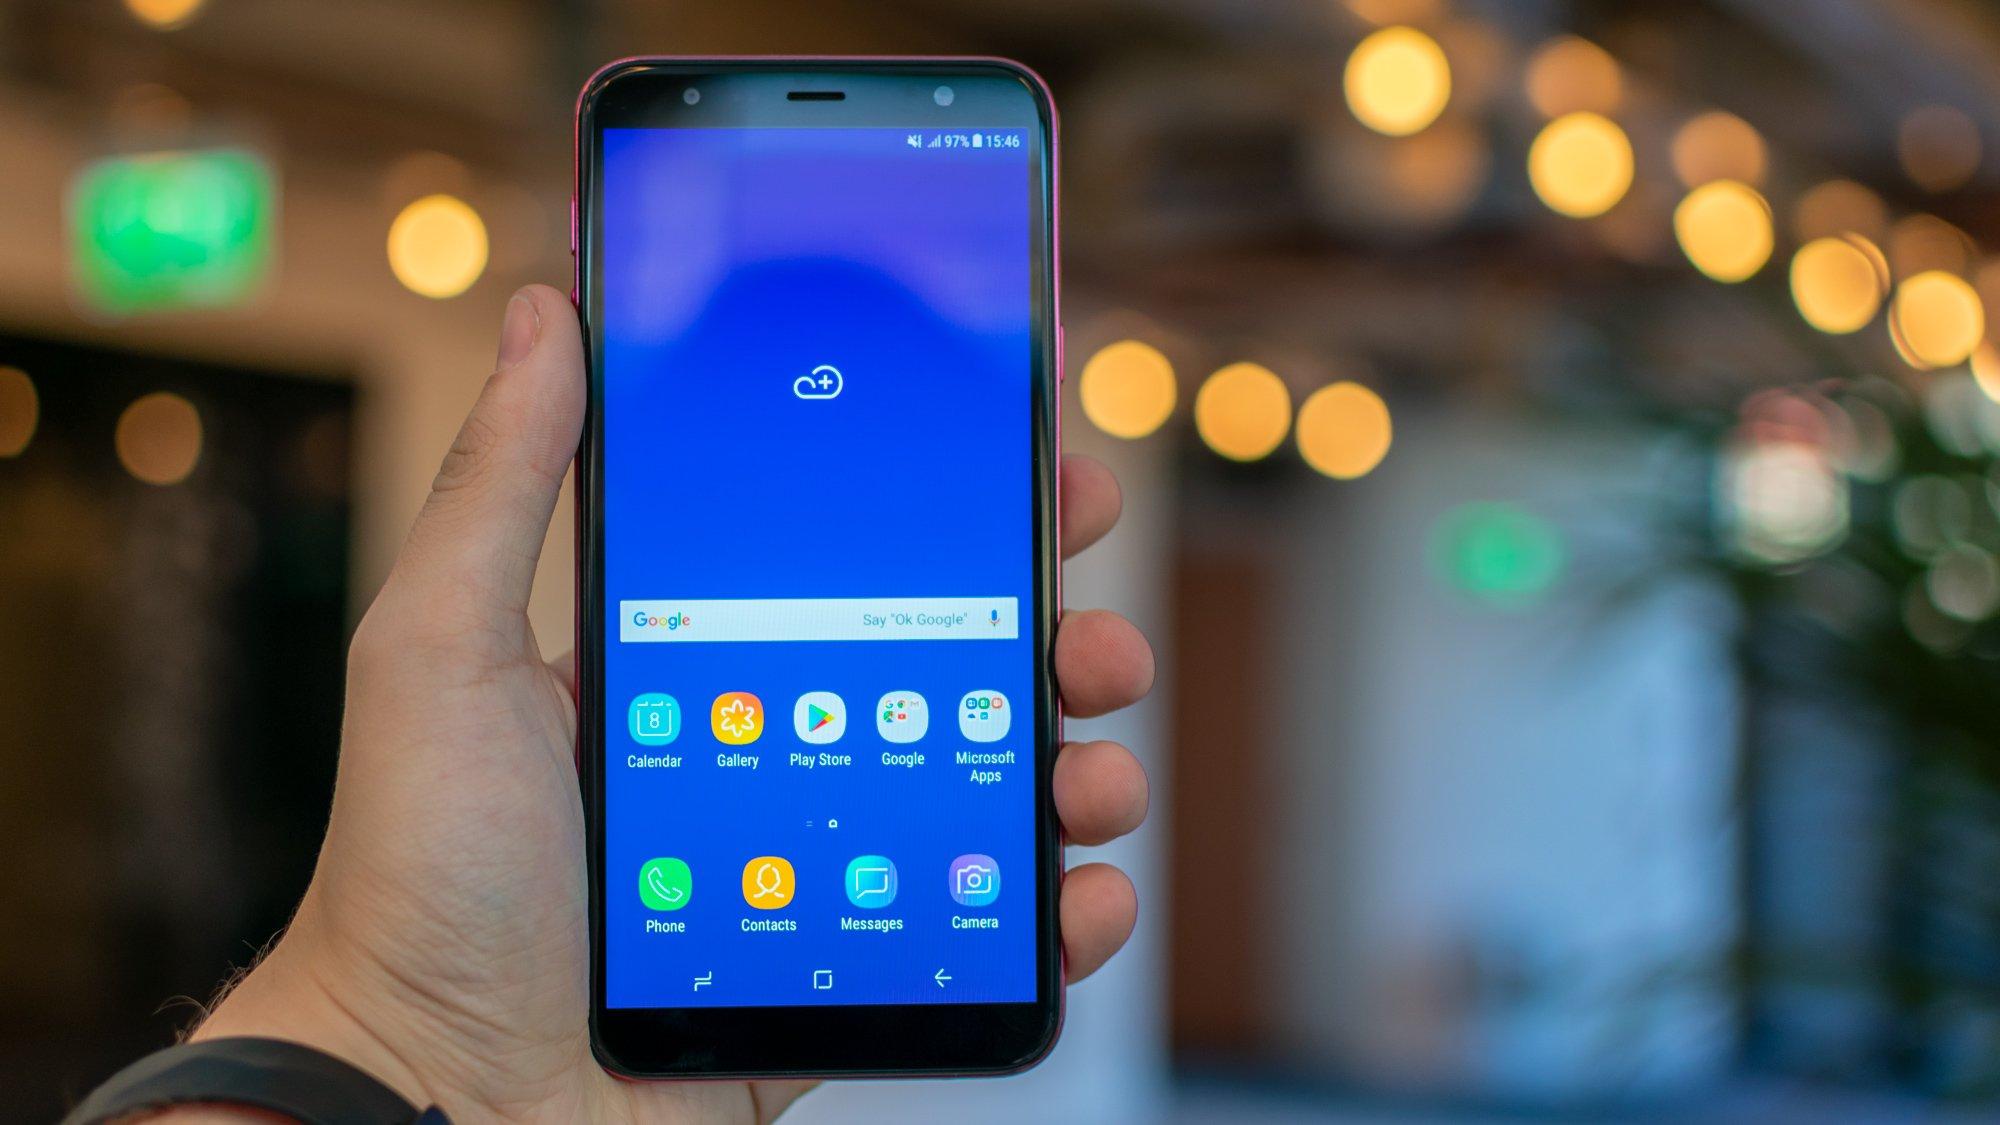 Samsung Galaxy J4 Plus review: Samsung's budget beauty | Expert Reviews